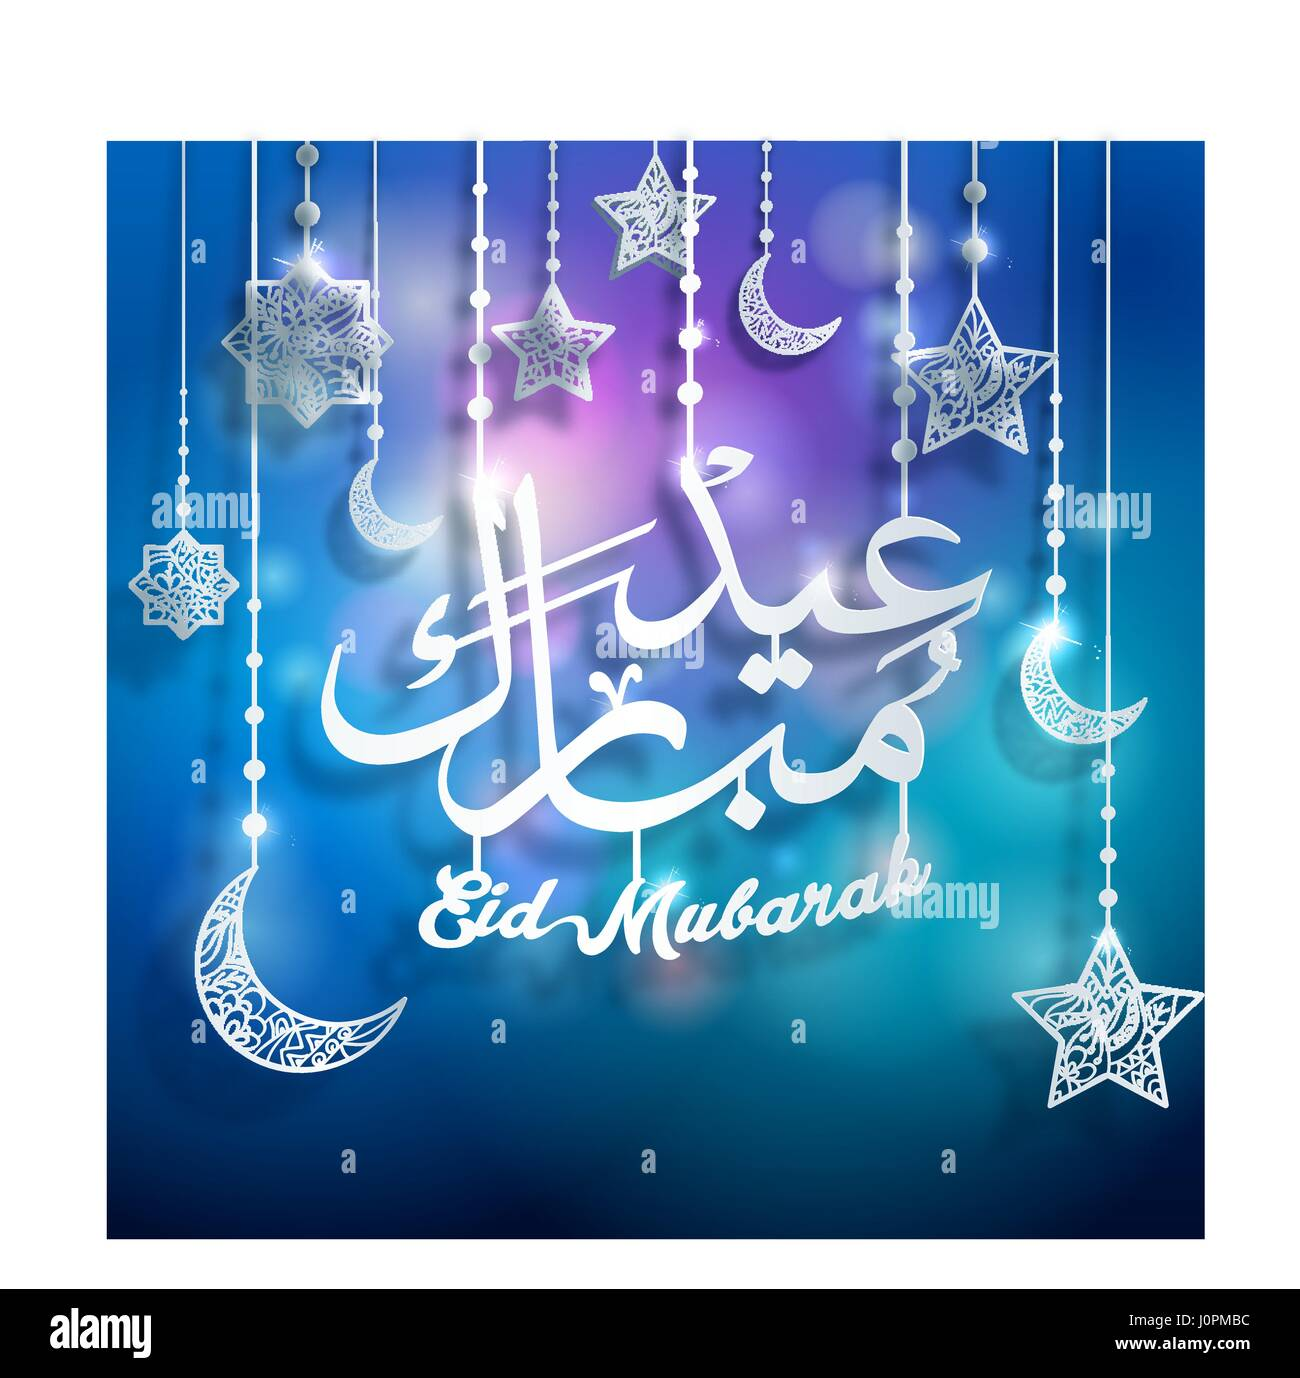 Eid mubarak arabic calligraphy decorative stock vector art eid mubarak arabic calligraphy decorative m4hsunfo Images